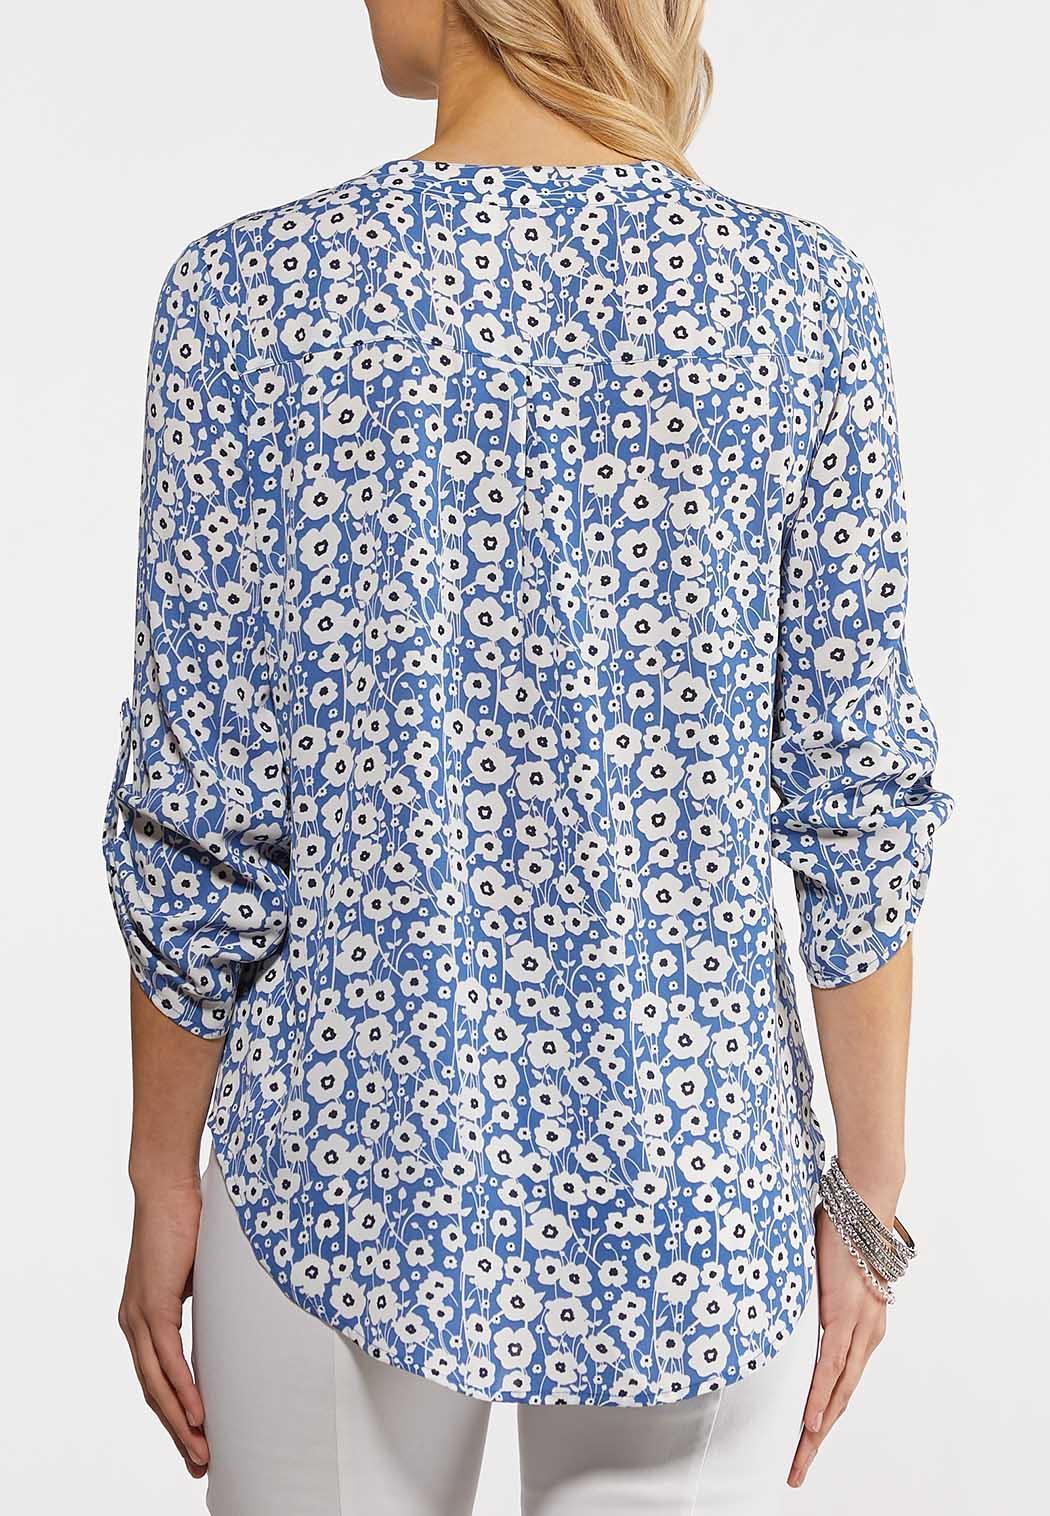 Ditsy Blue Floral Top (Item #44239026)